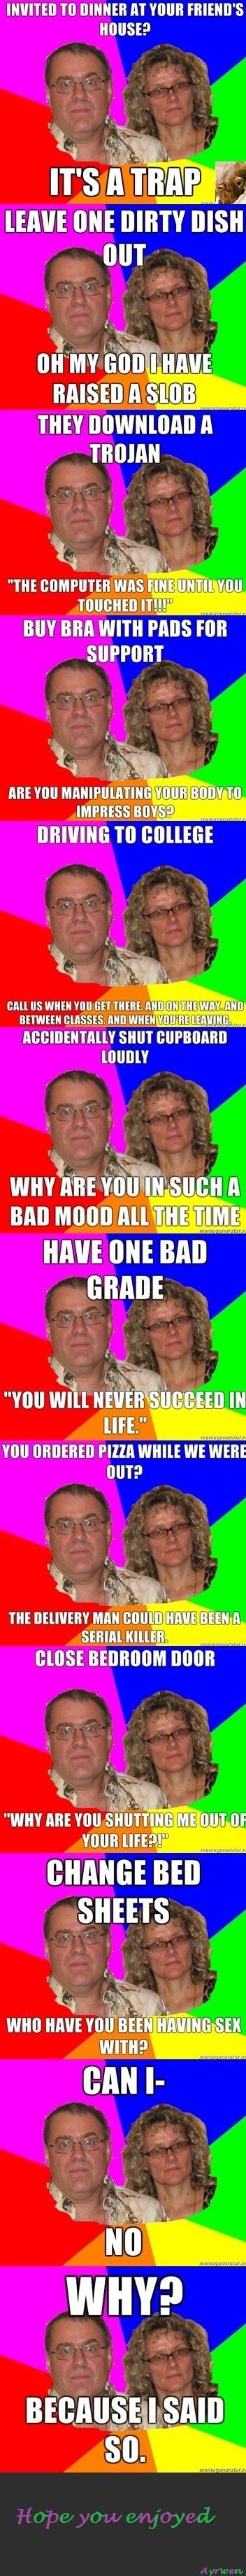 Paranoid Parents Comp. Part 2 is up funnyjunk.com/funny_pictures/2036170/Paranoid+Parents+Comp+2/ Part 3 funnyjunk.com/funny_pictures/2036983/Paranoid+Parents+C